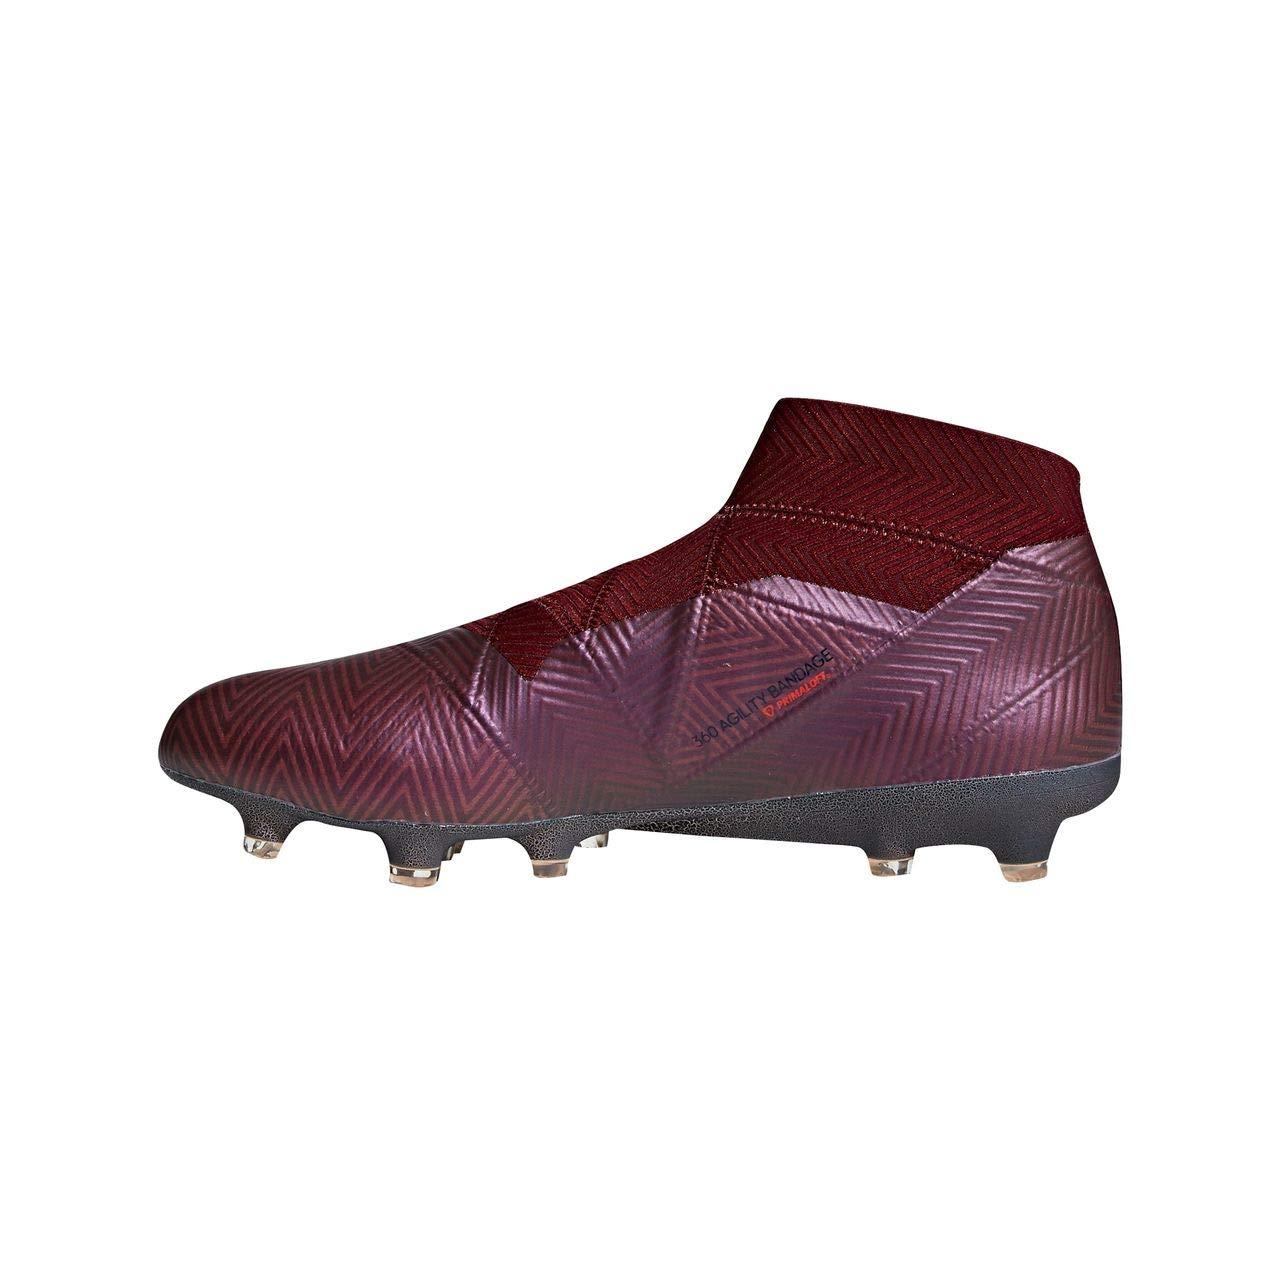 size 40 dcc4c ad00f adidas Nemeziz 18+ FG, Bota de fútbol, Maroon-Legend Ink-Collegiate  Burgundy, Talla 12 UK (47 1 3 EUR)  Amazon.es  Zapatos y complementos